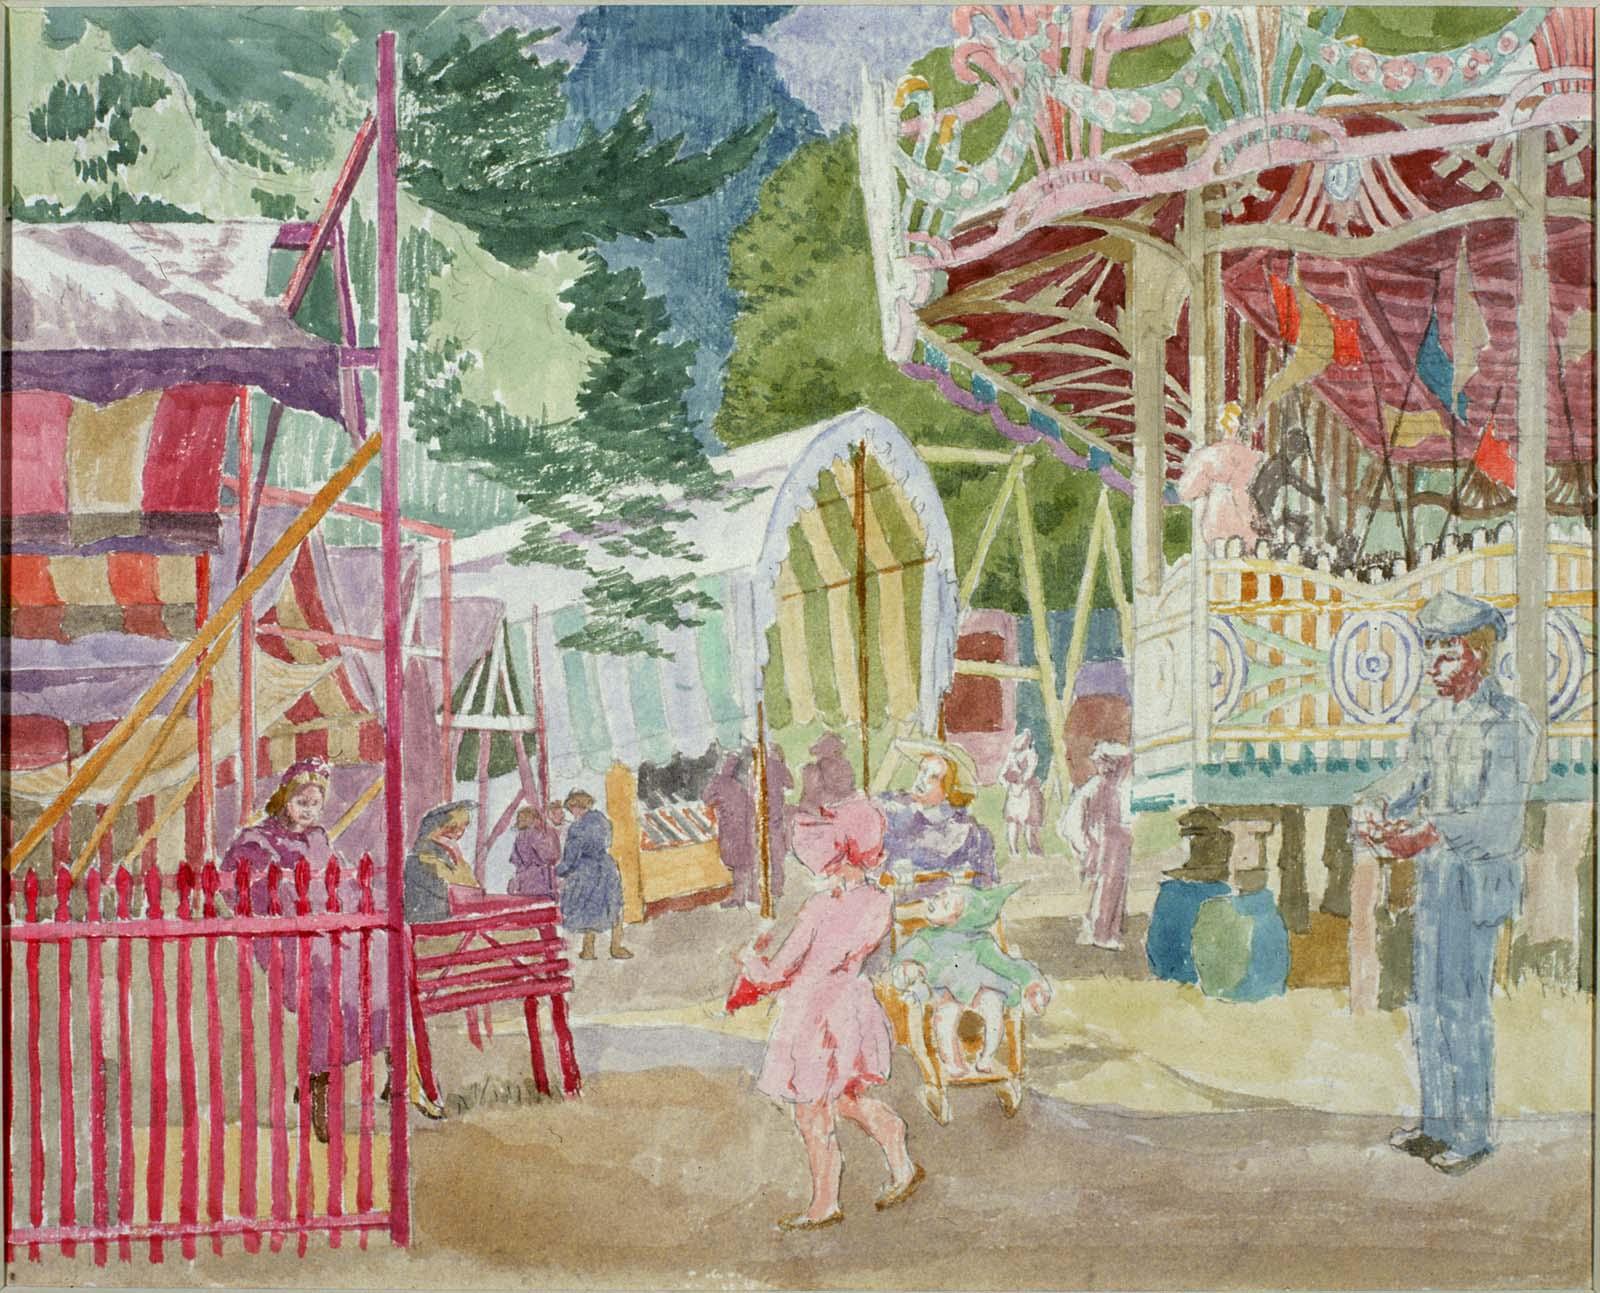 watercolour sketch of a fairground